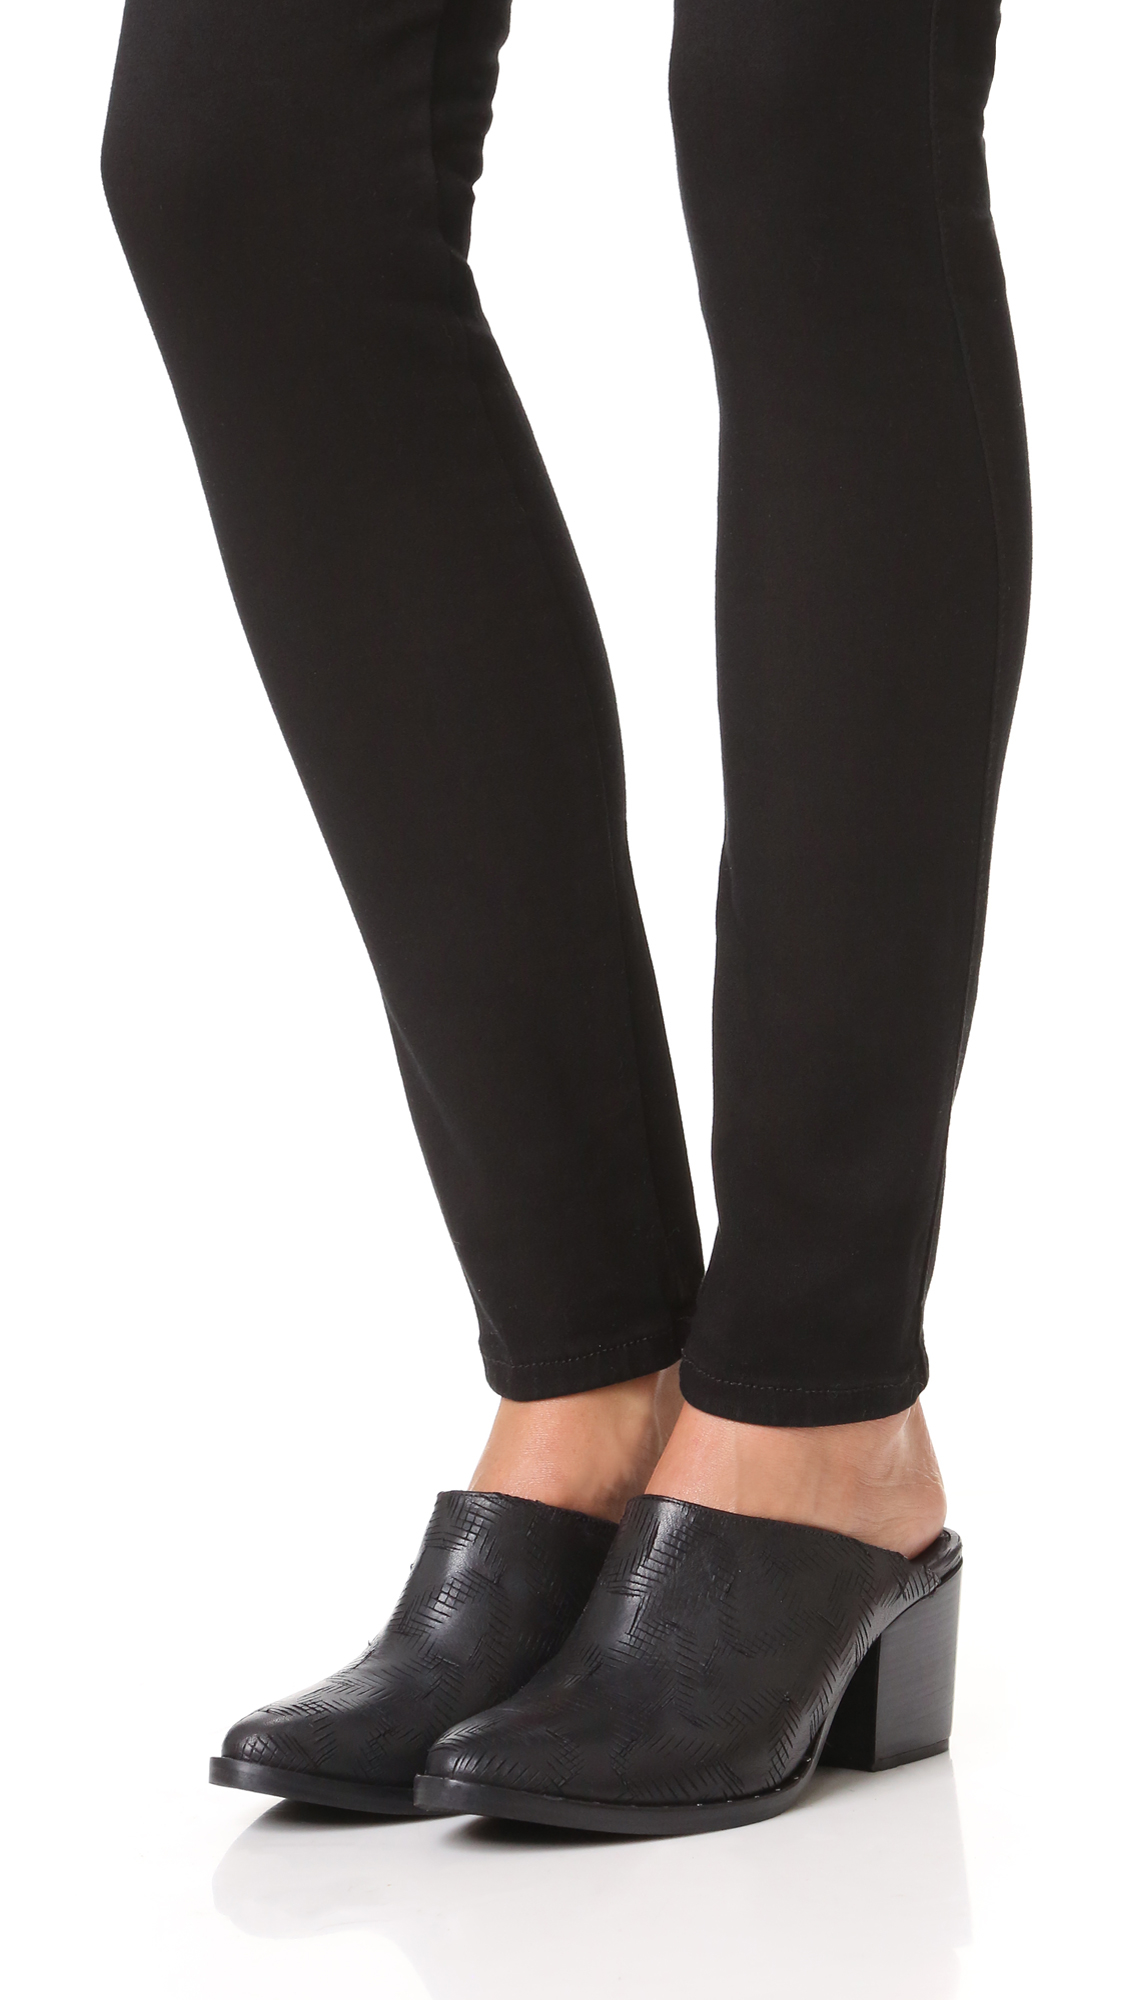 f4263fe7997c7 https   www.lyst.com shoes msgm-low-tops-trainers-dark-green-2 ...